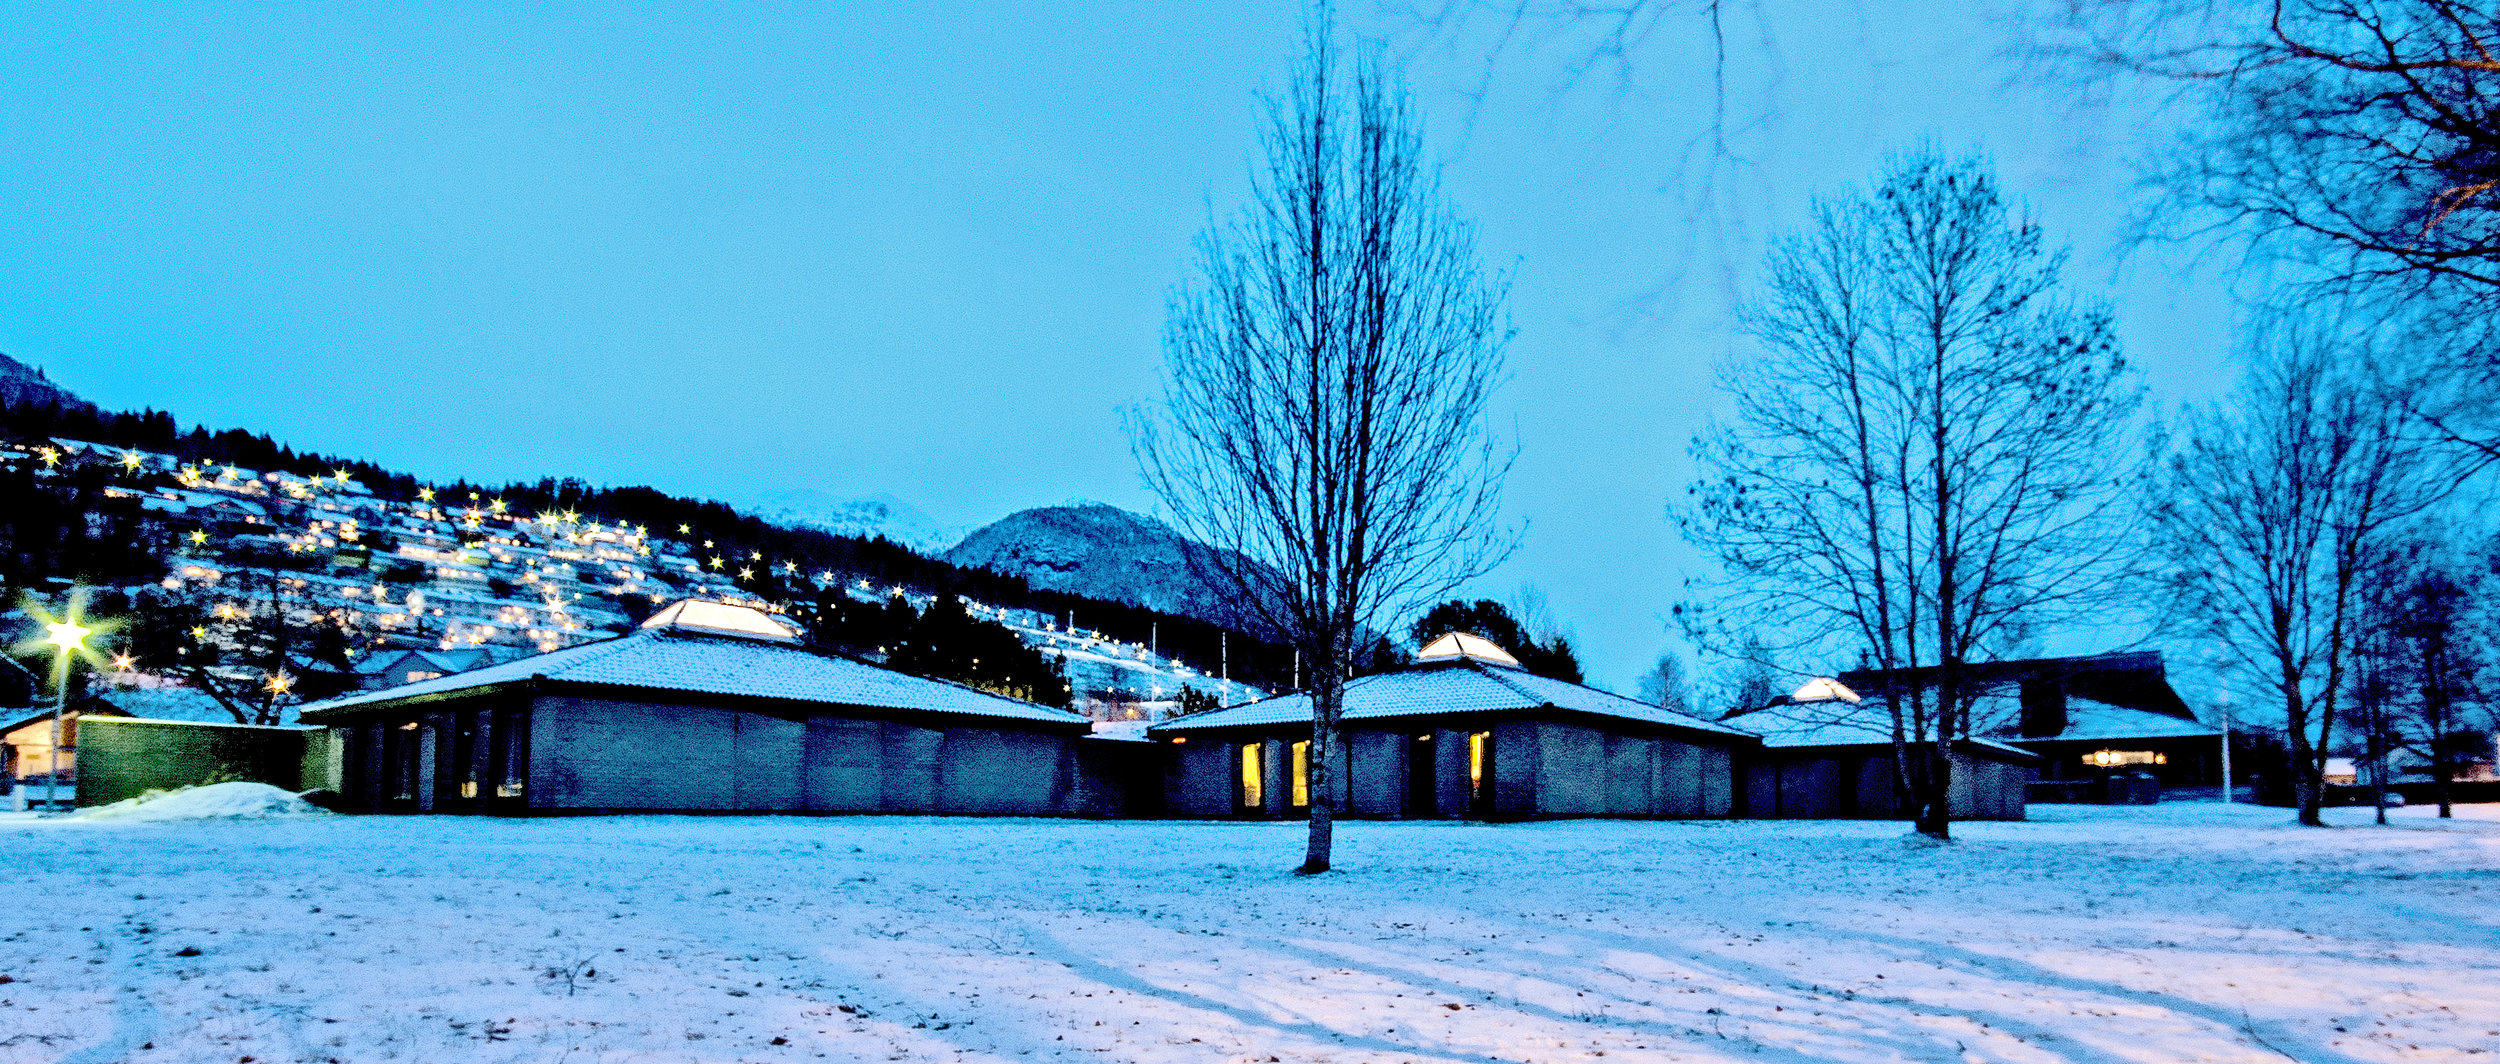 FFHS Vinter 01.jpg